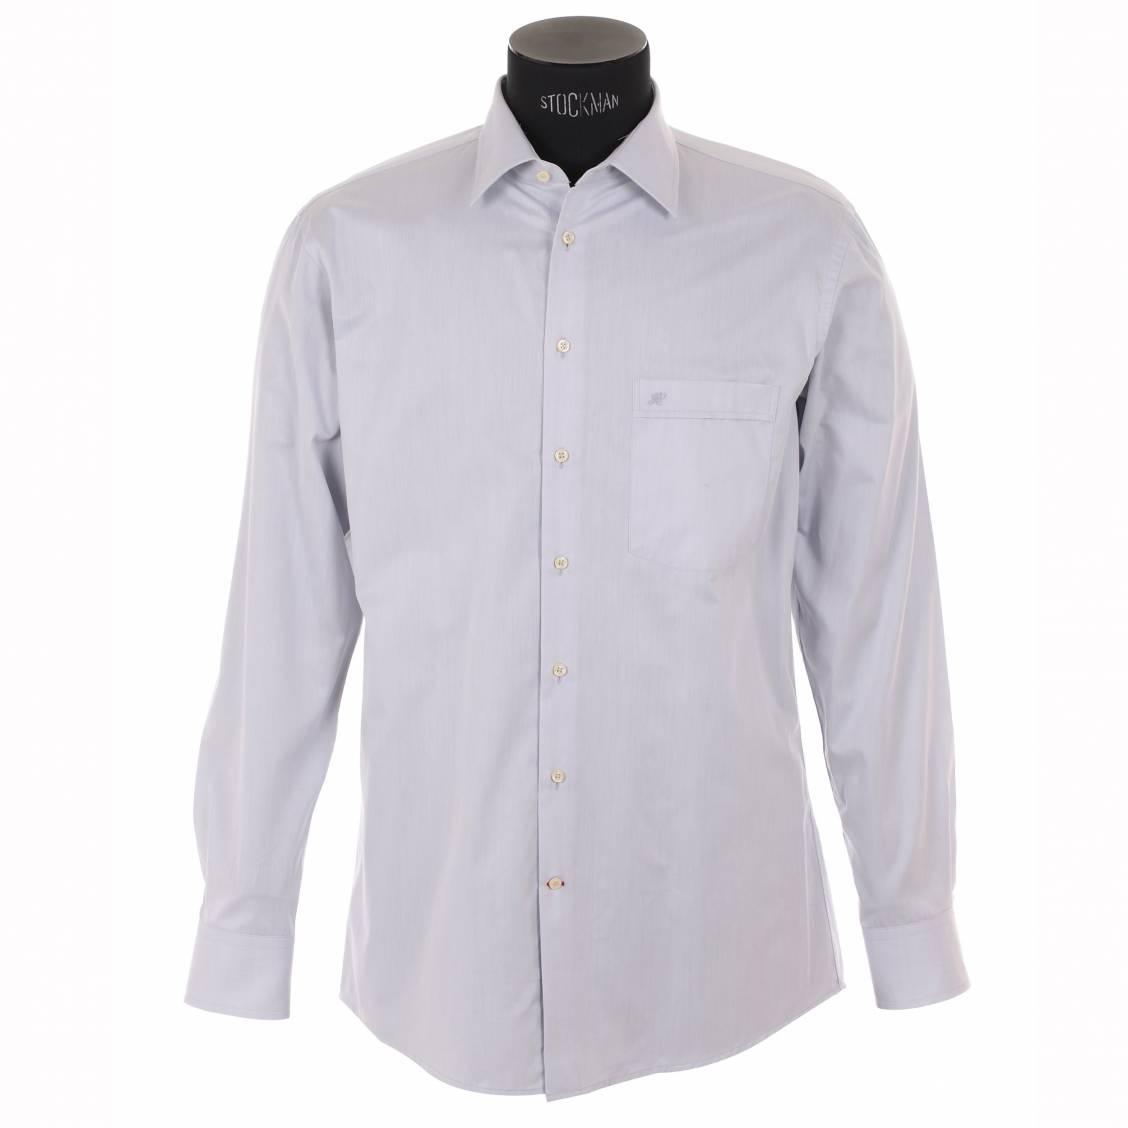 chemise homme sans repassage jean chatel grise rue des hommes. Black Bedroom Furniture Sets. Home Design Ideas